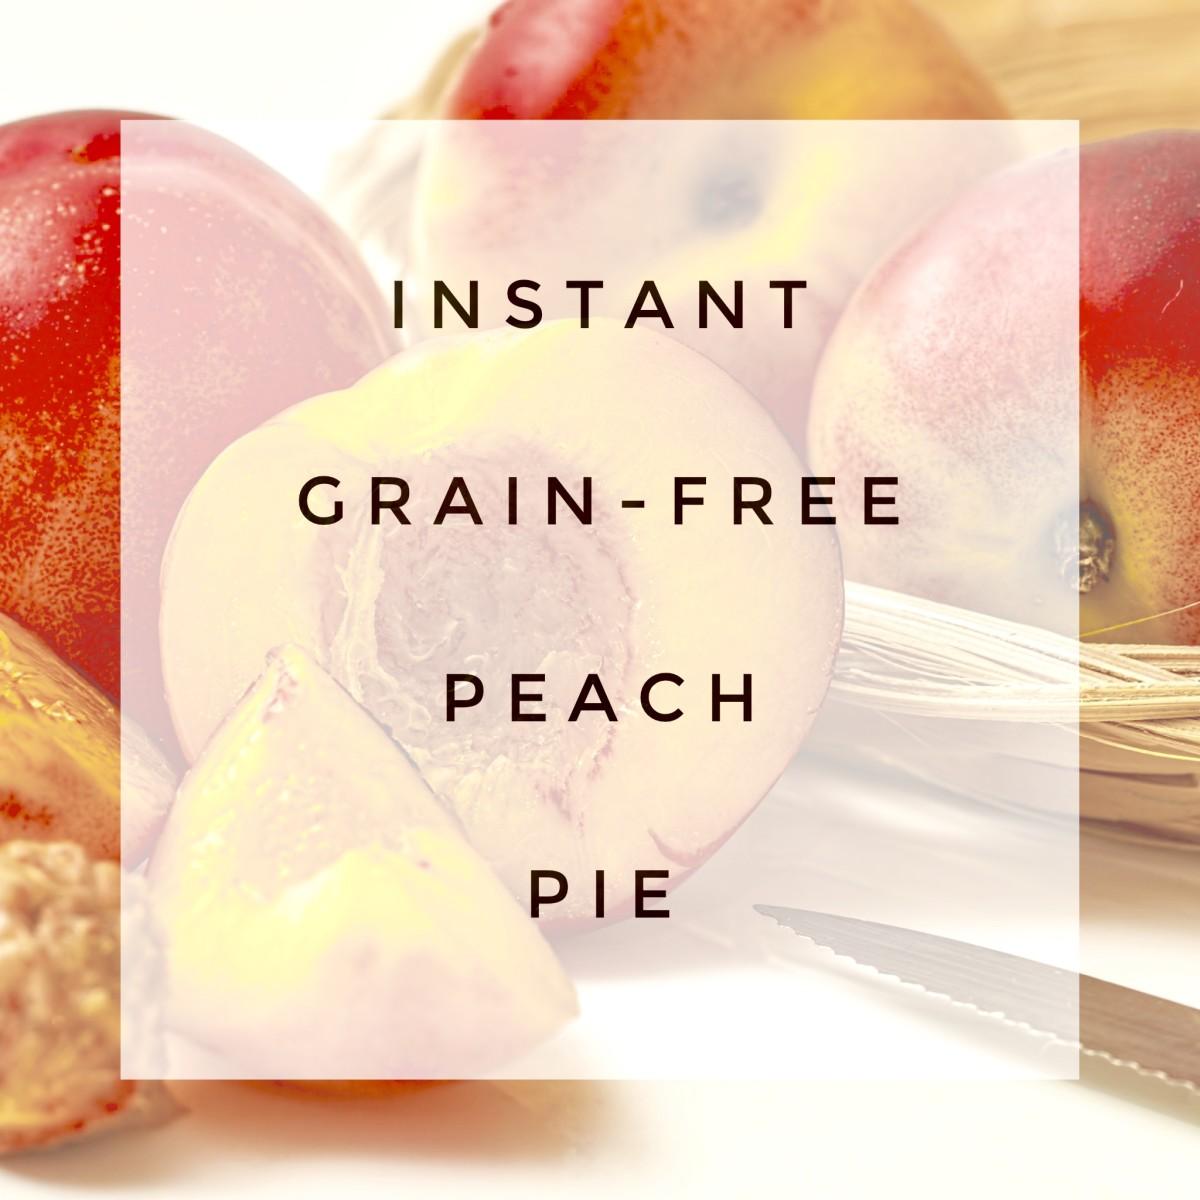 Grain-Free Instant Peach Pie